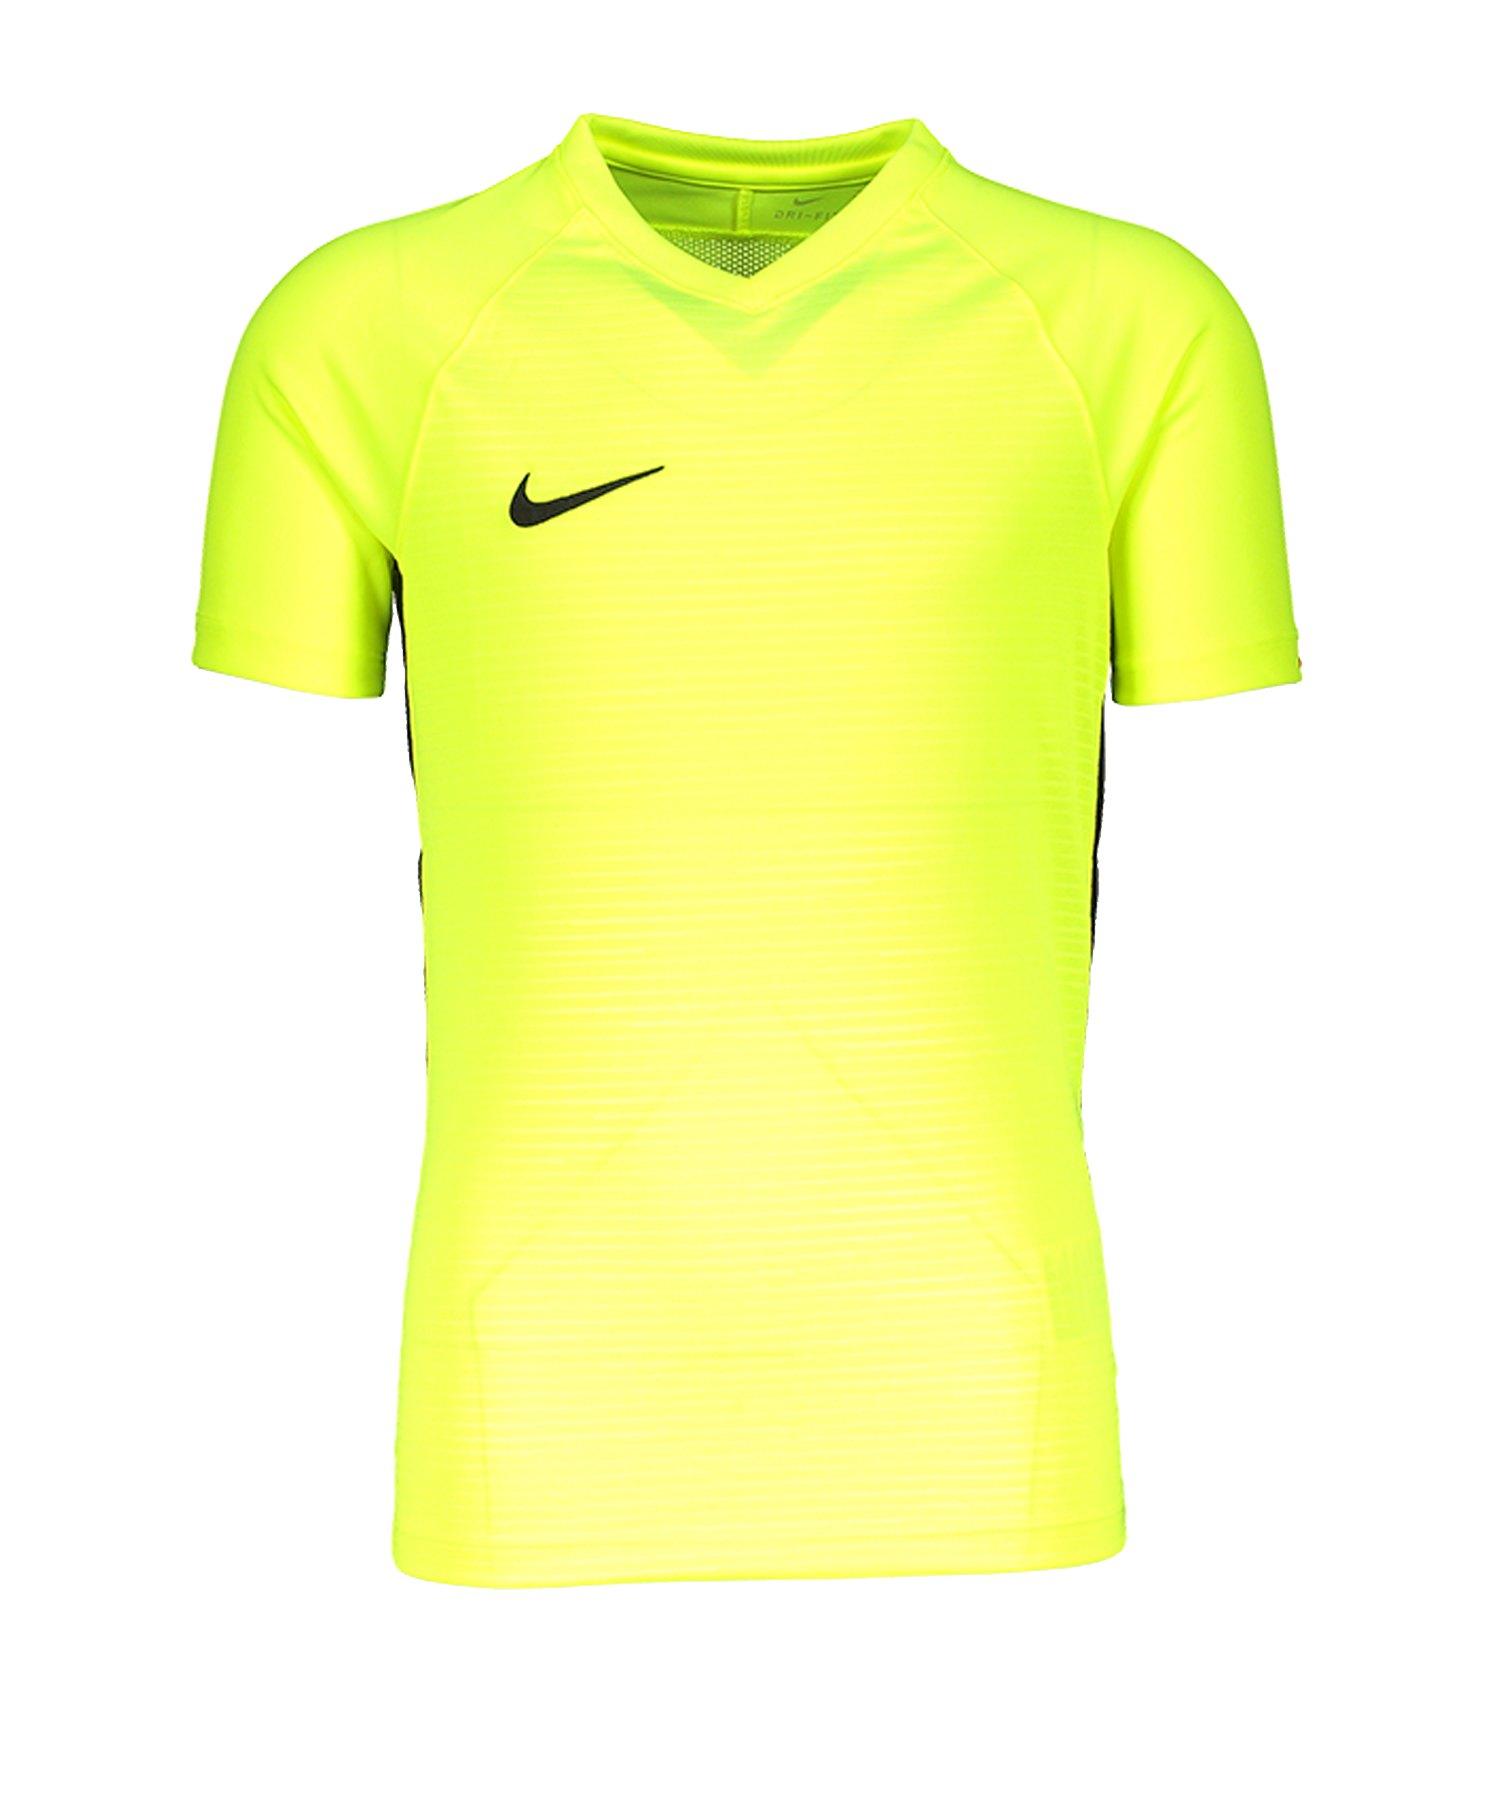 Nike Tiempo Premier Trikot Kids Gelb F702 - gelb